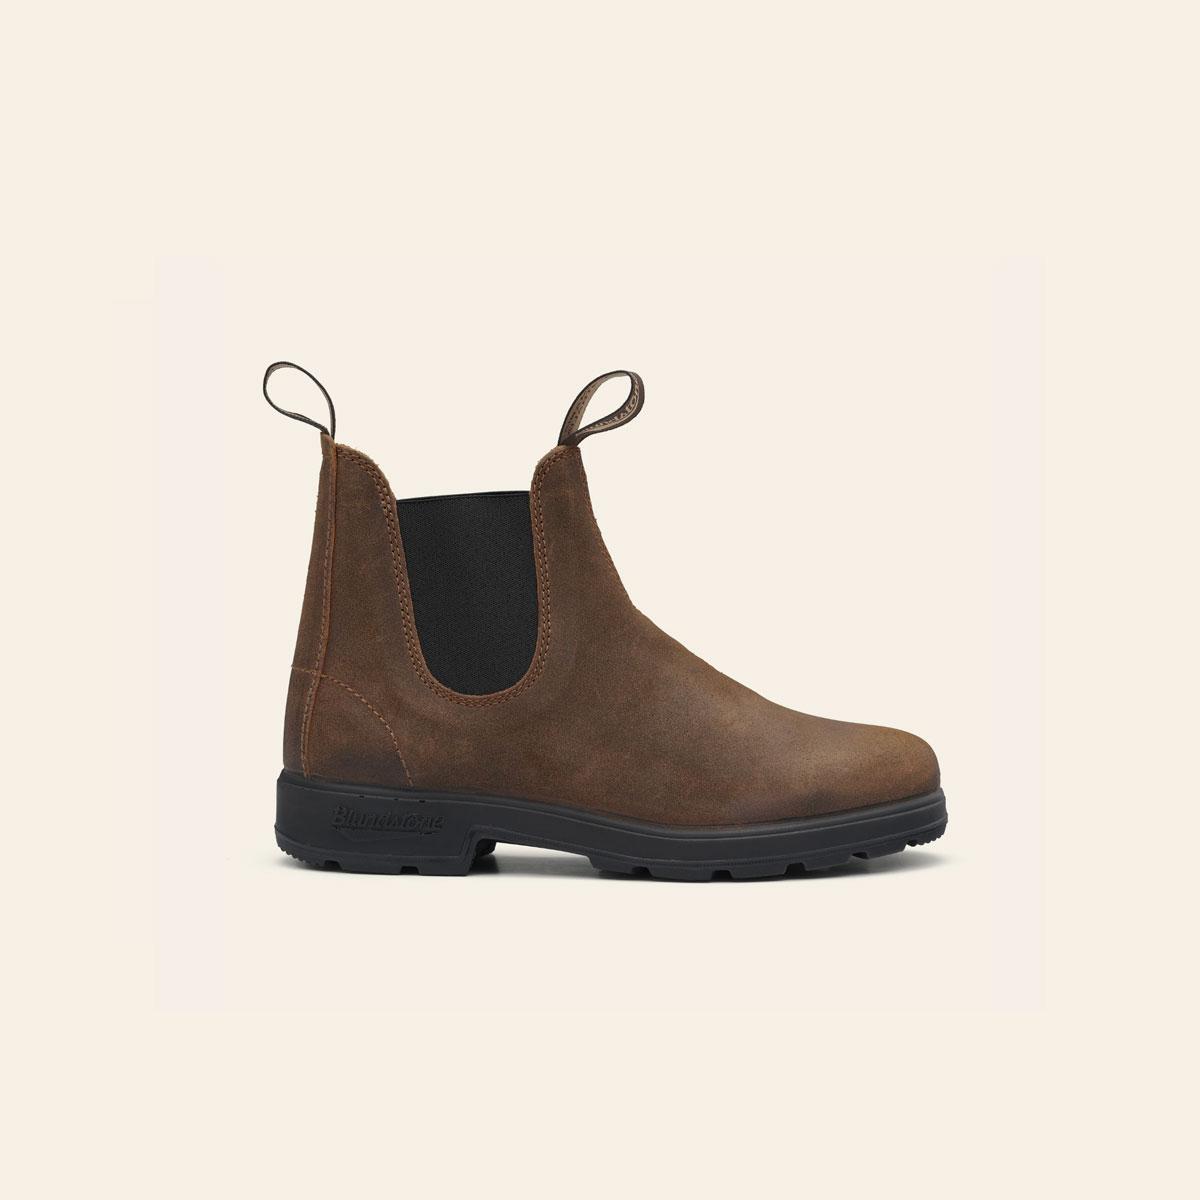 BLUNDSTONE Original Boots 1911 Waxed suede tobacco